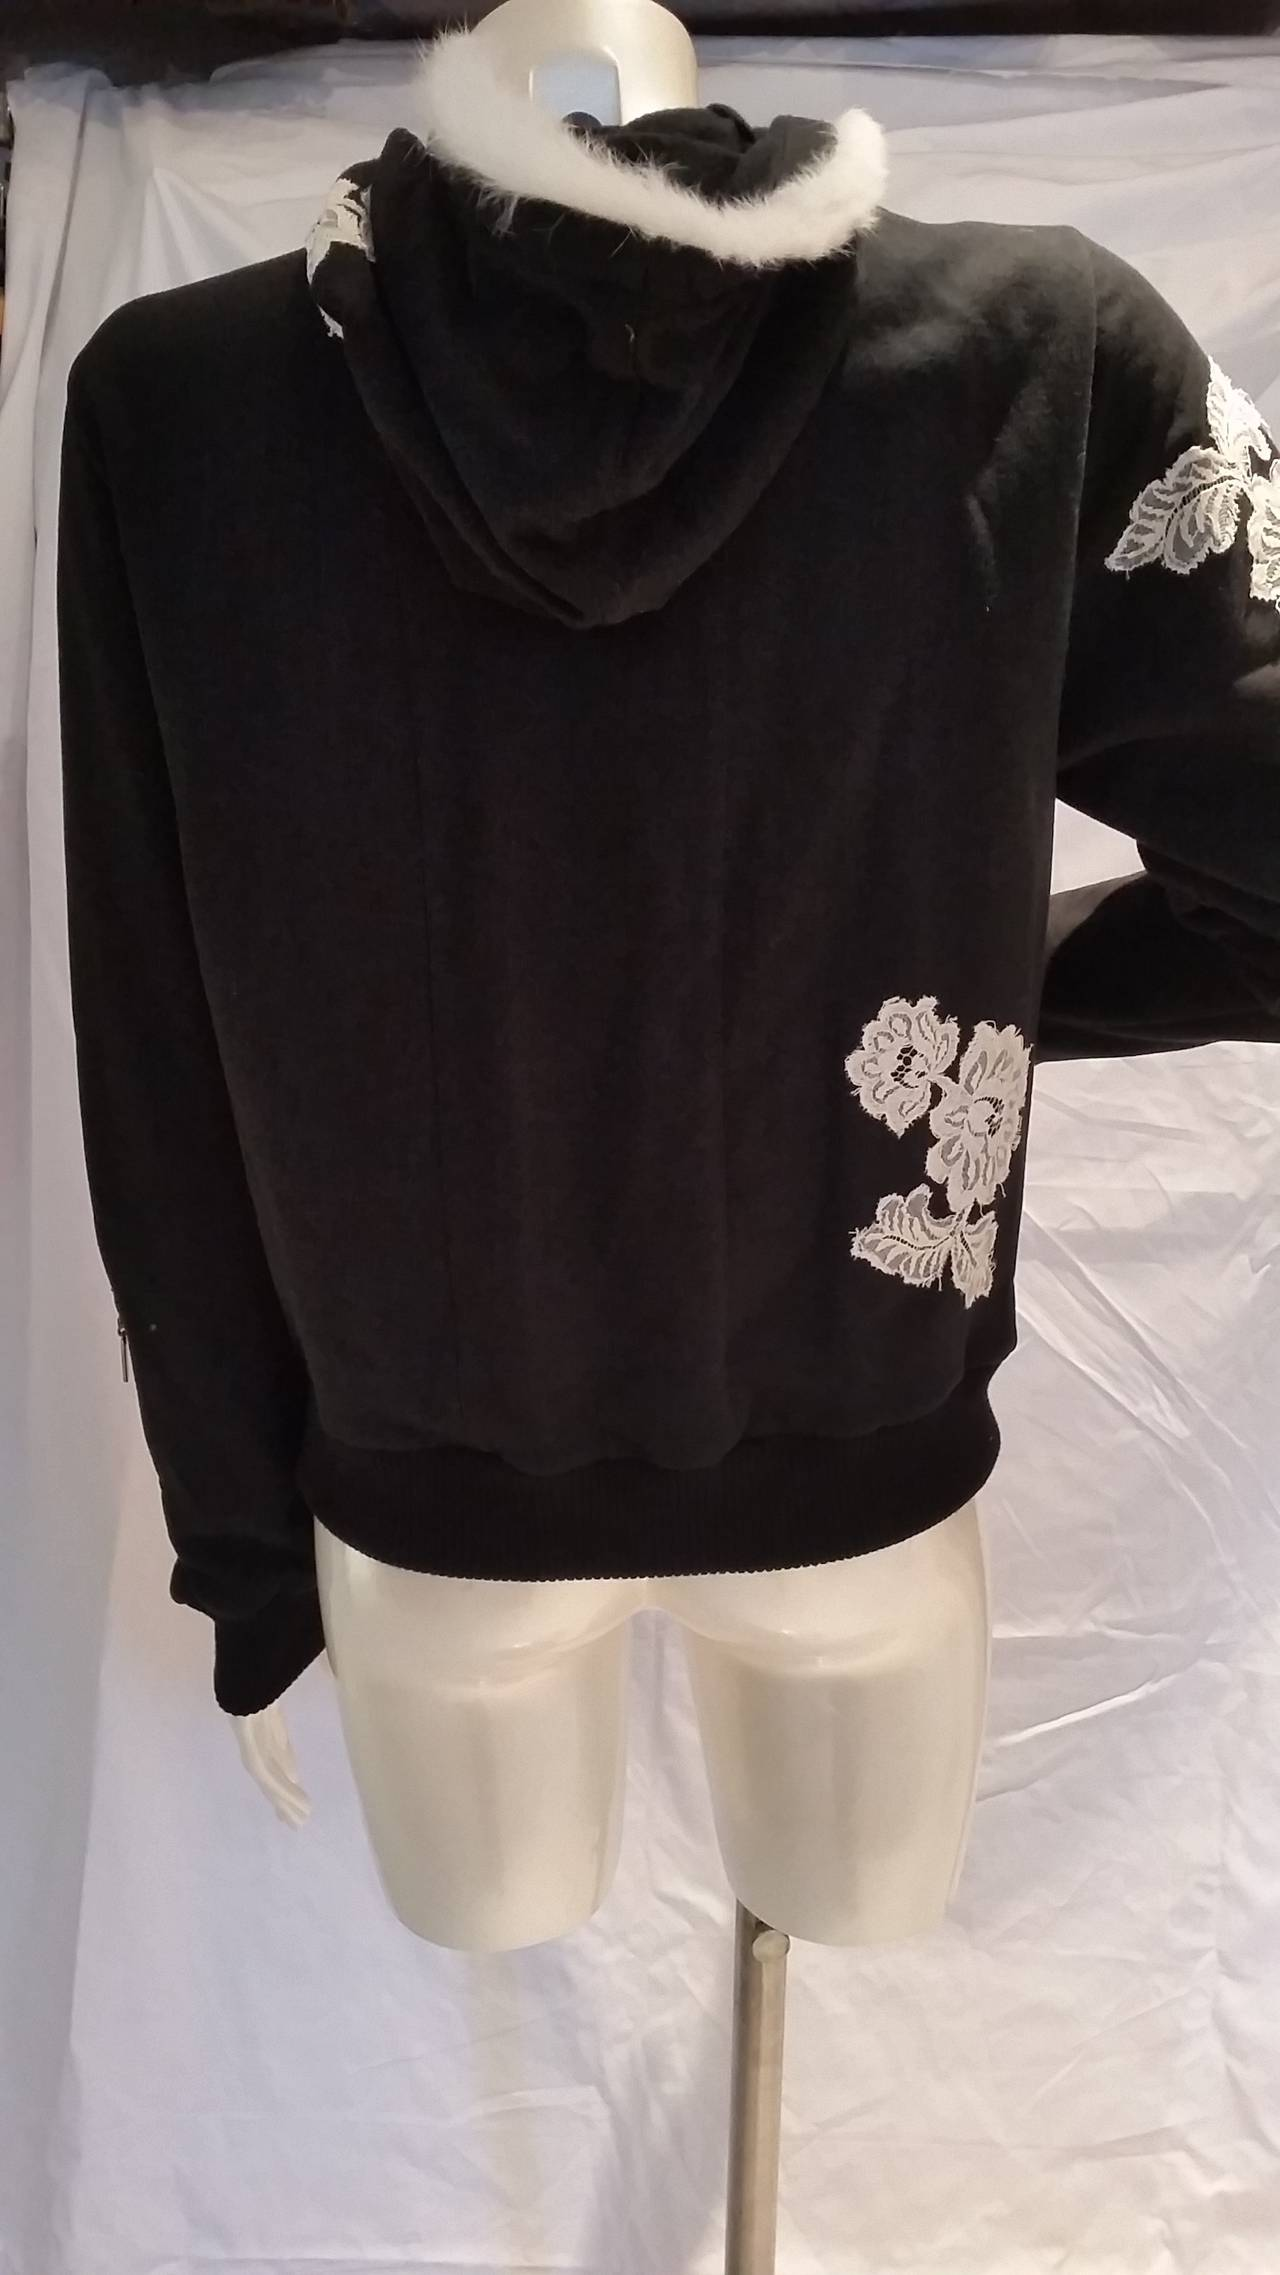 2000s John Galliano black and white sweater In New Condition For Sale In Capri, IT